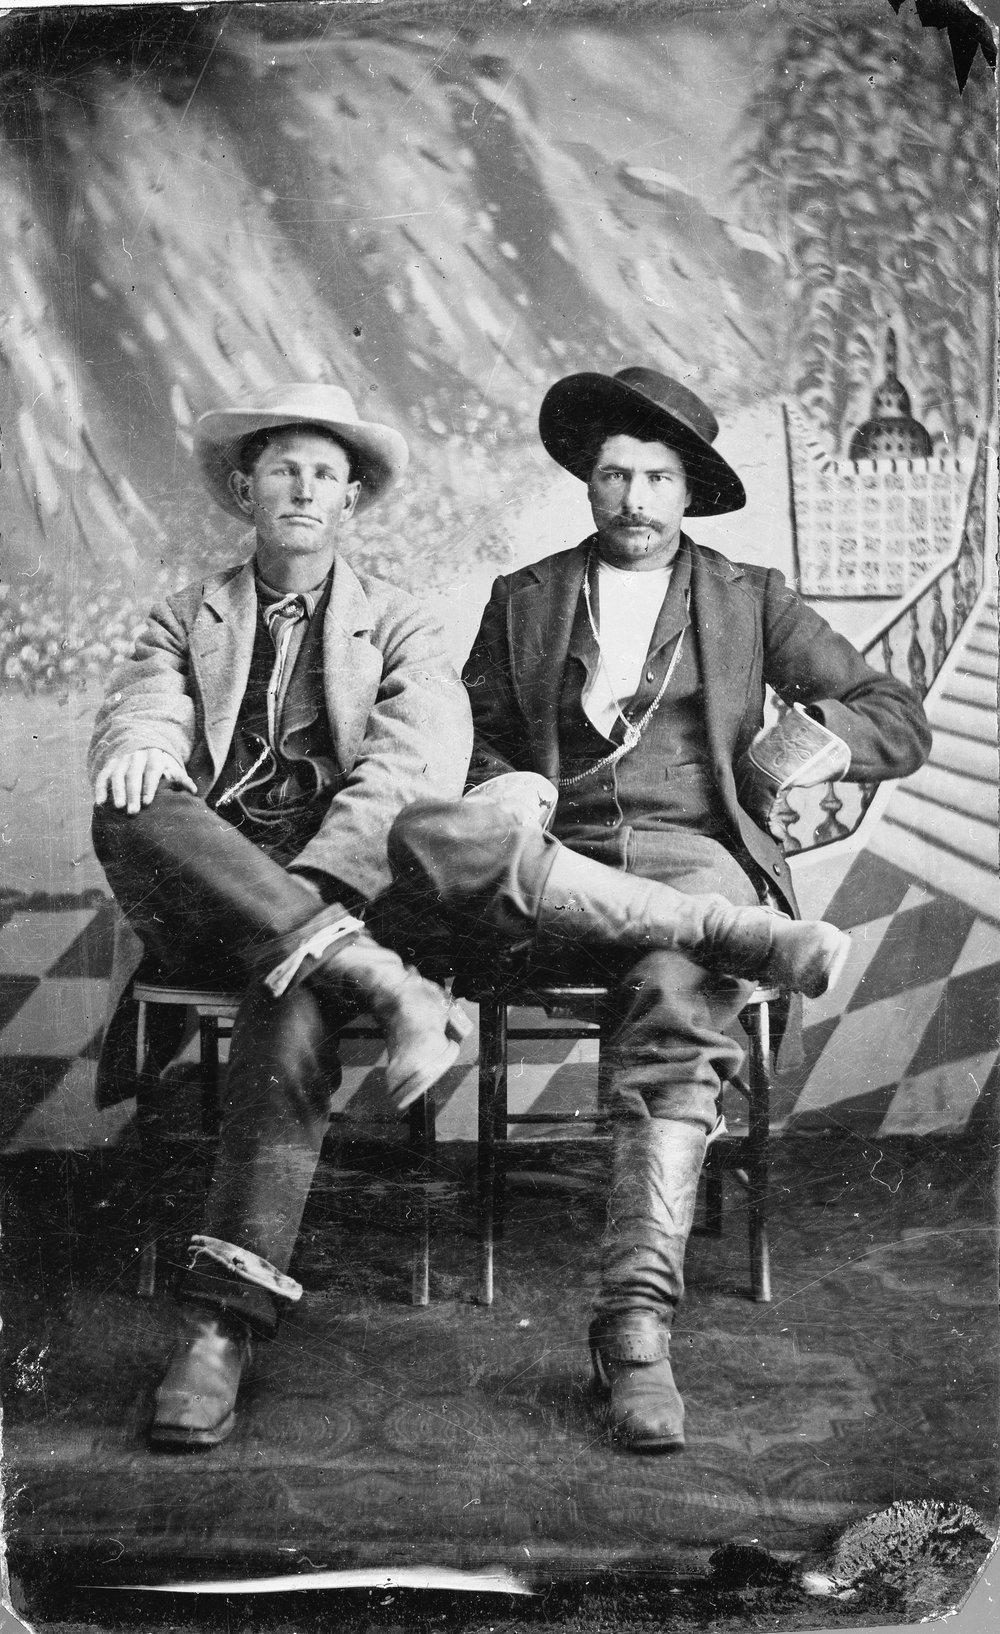 Cowboys - 1